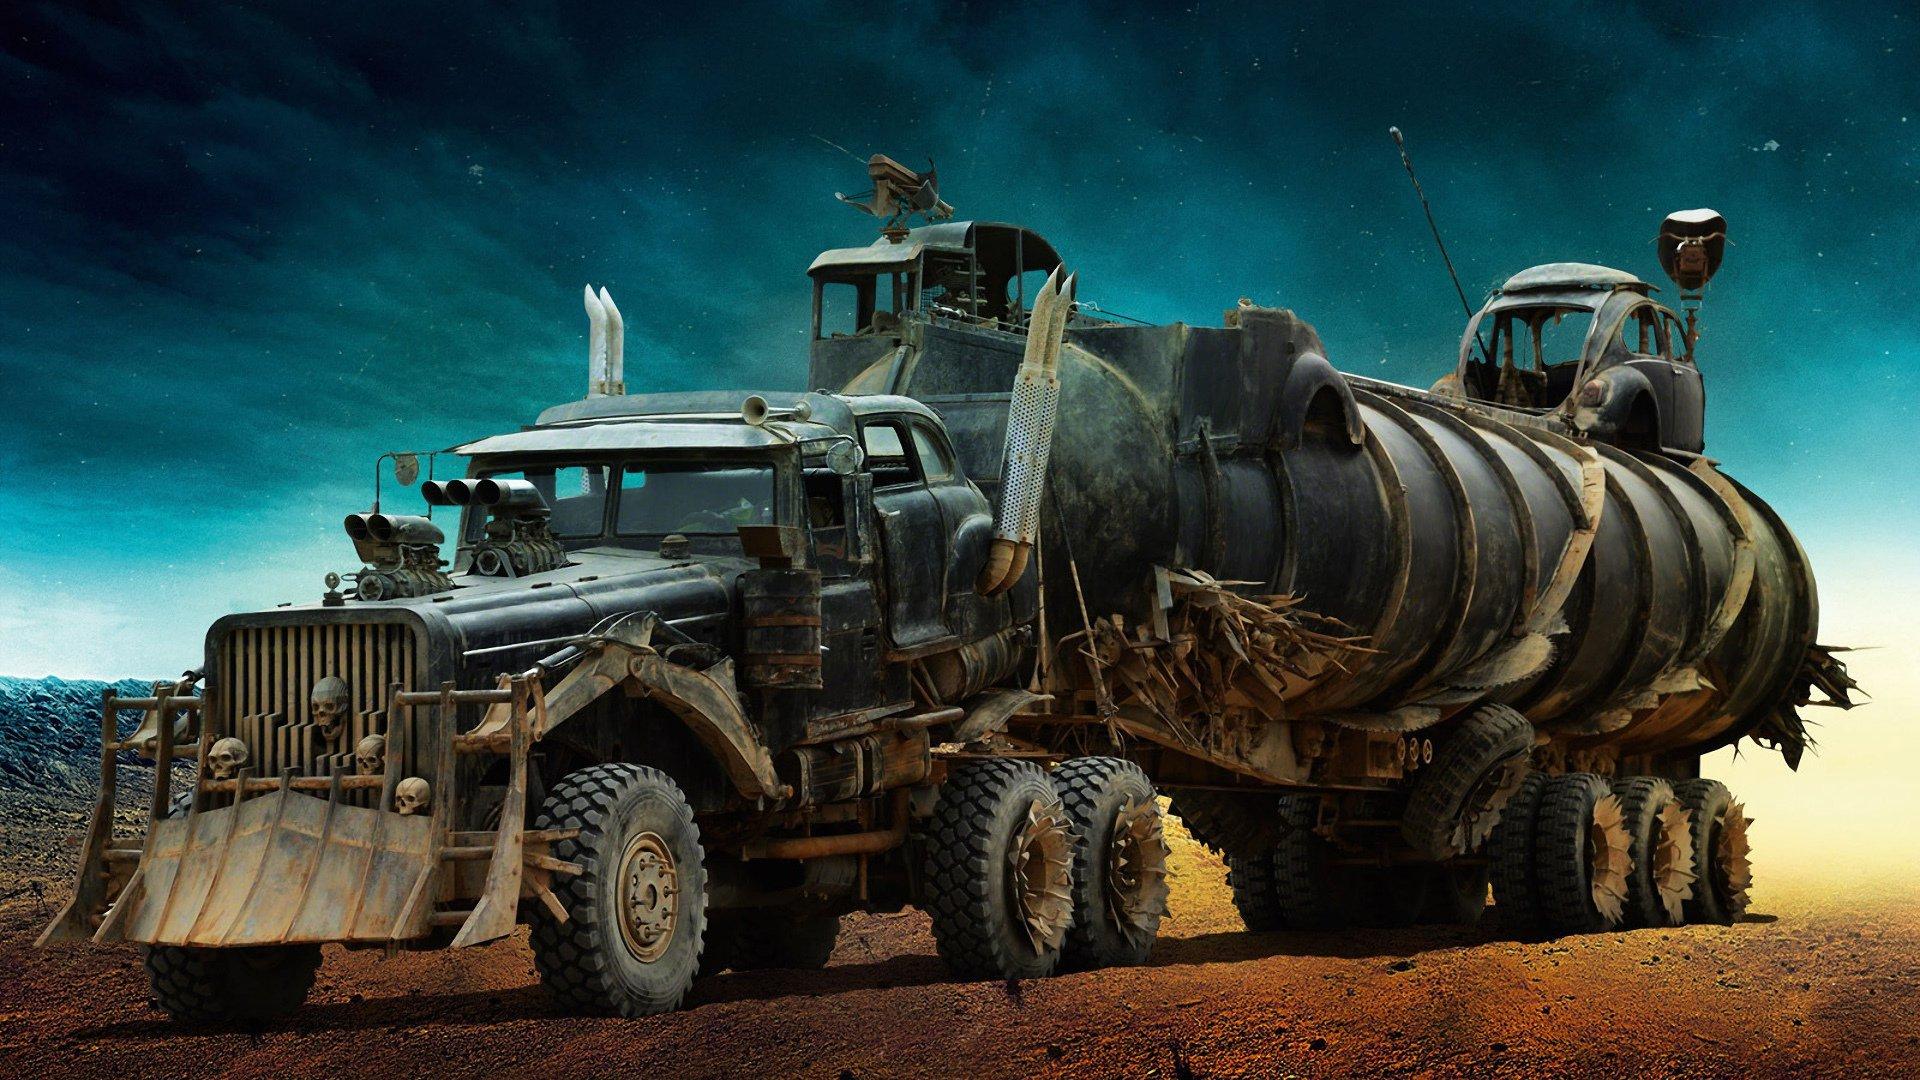 Max Fury Road Movie Truck Vehicle HD Wallpaper   Stylish HD Wallpapers 1920x1080